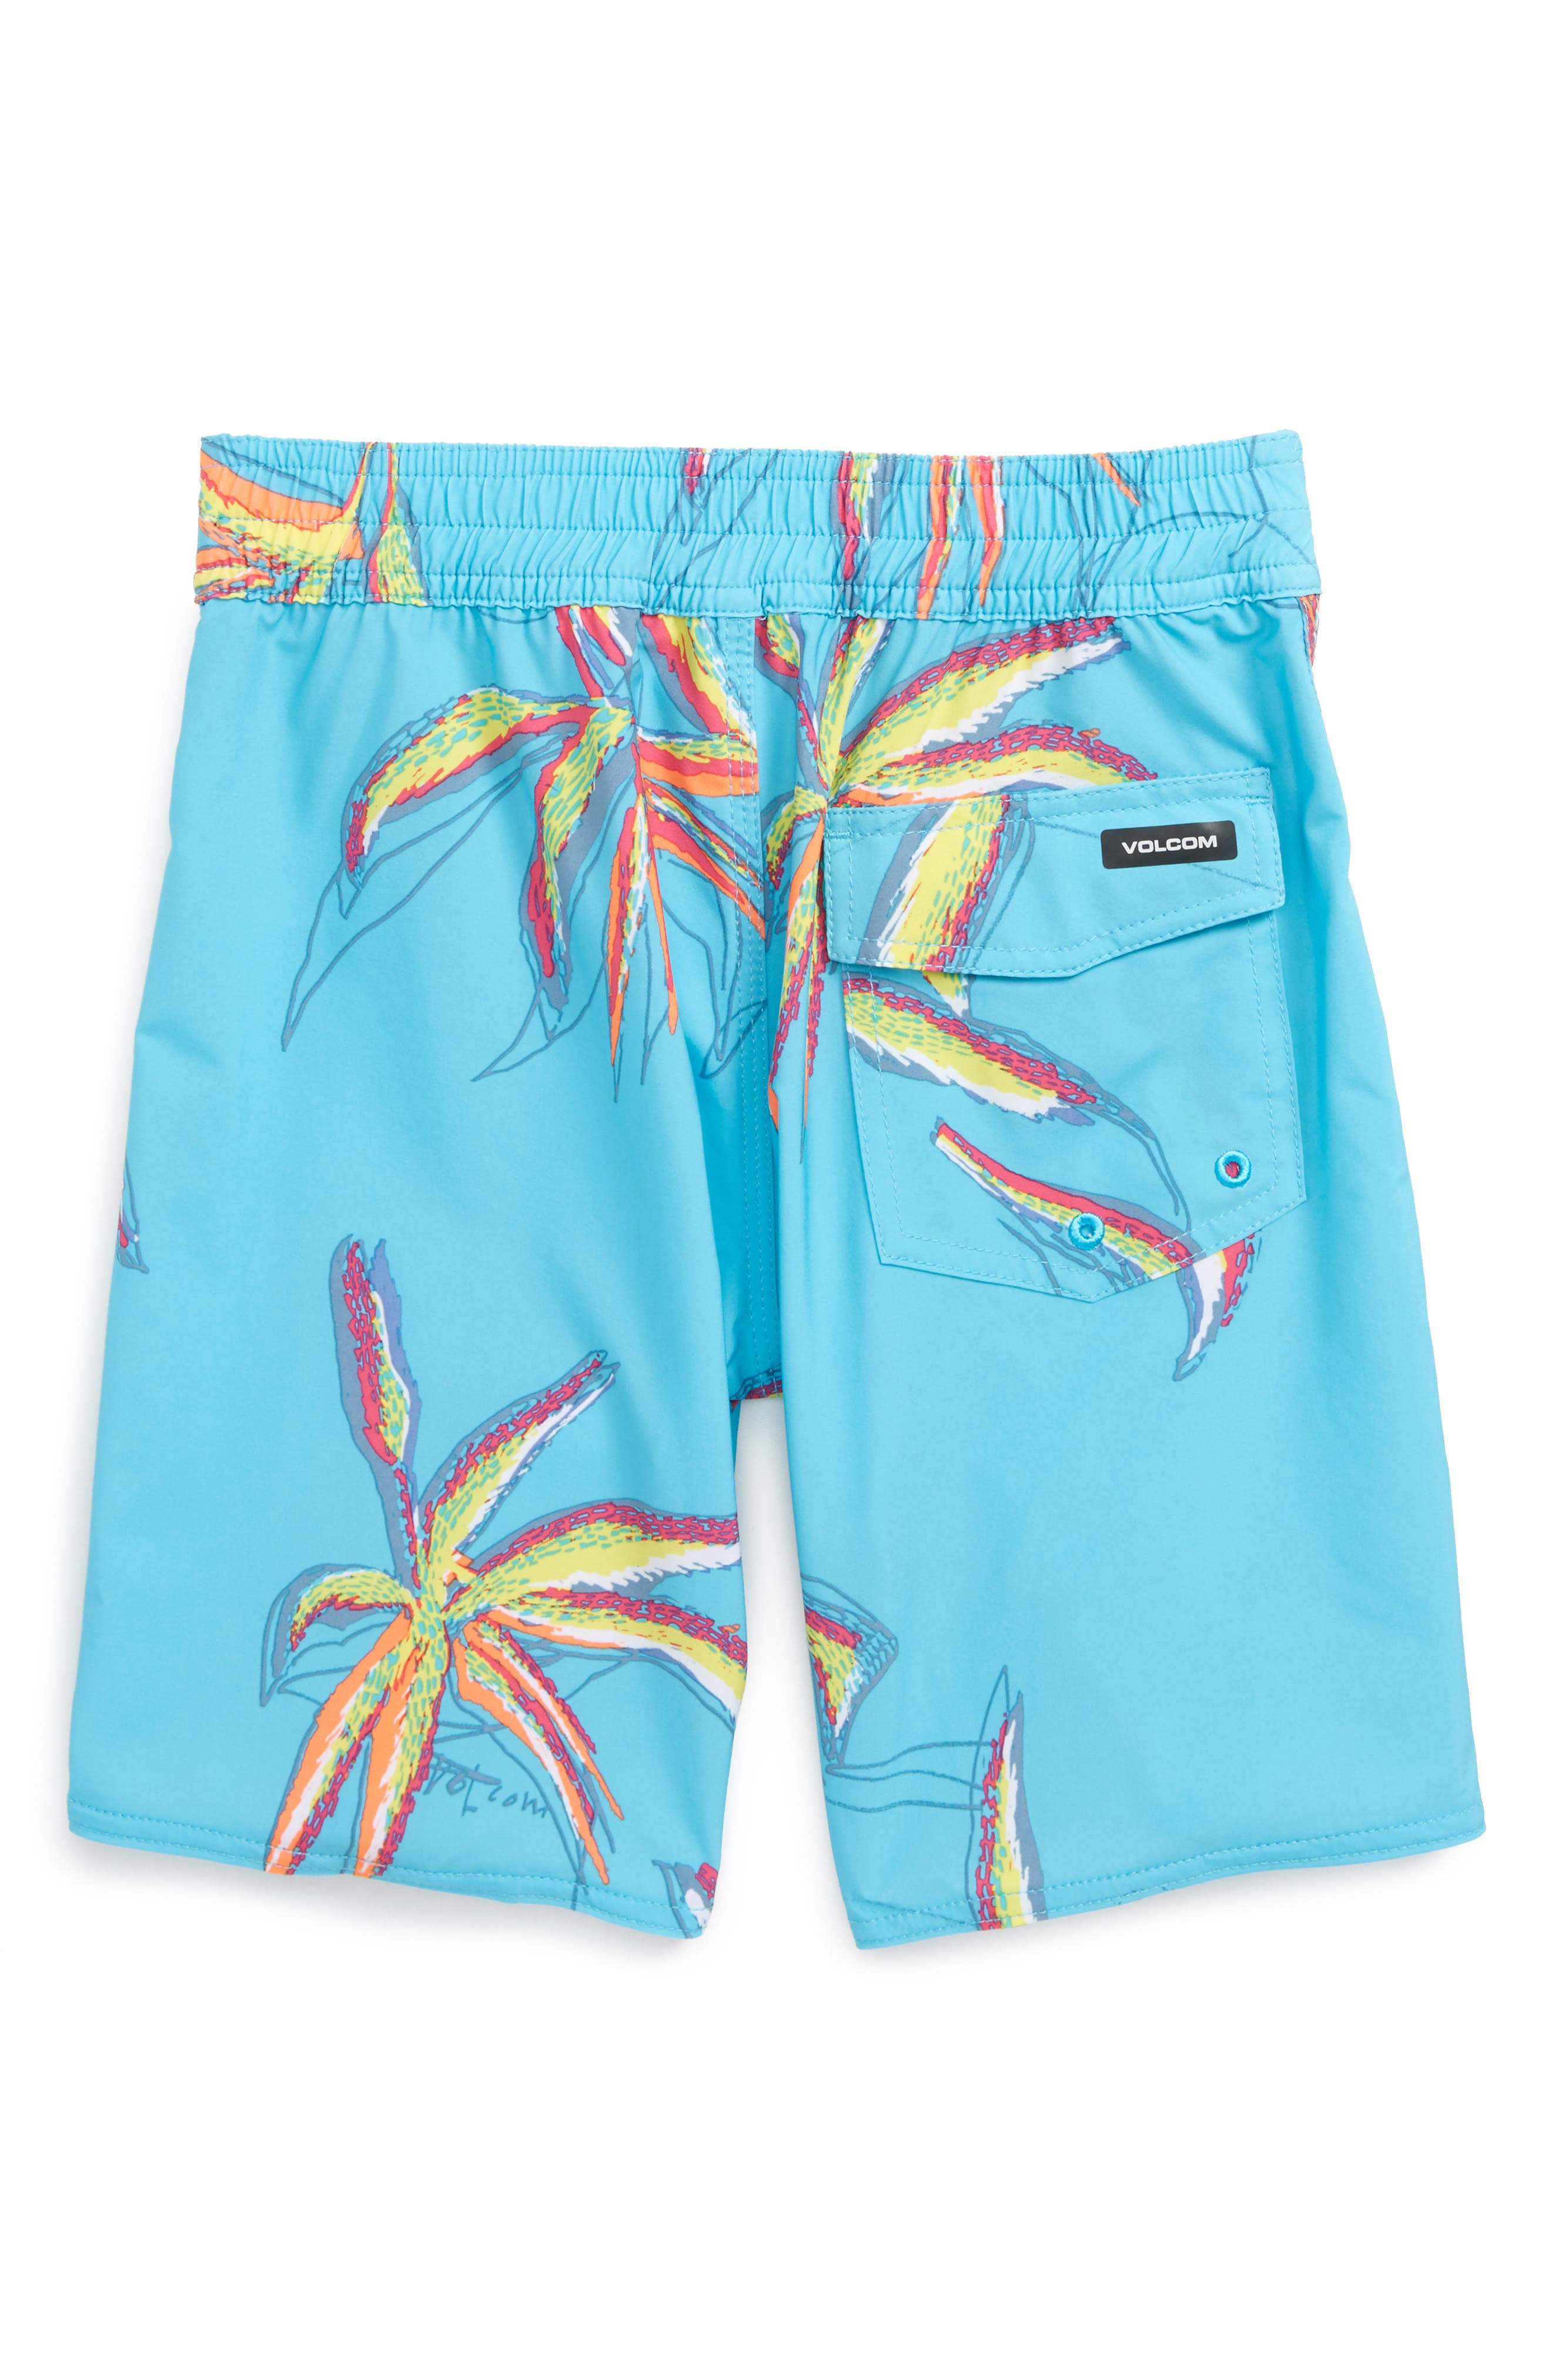 Tropical Print Board Shorts,                             Alternate thumbnail 2, color,                             DUSTY AQUA